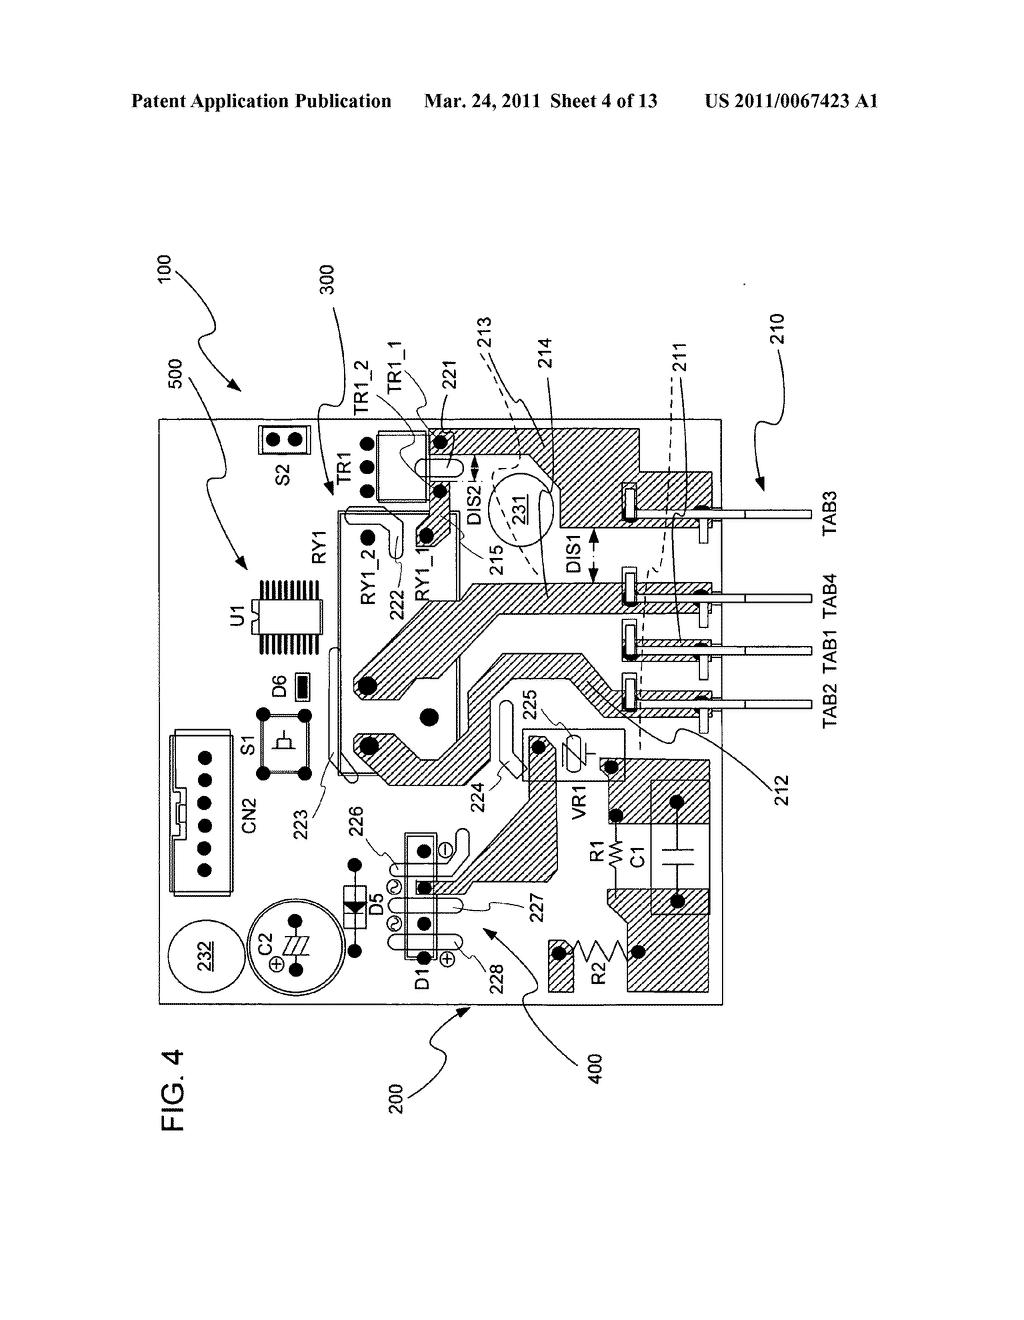 Generac Gp15000e Wiring Diagram Generac Gp7500e Wiring